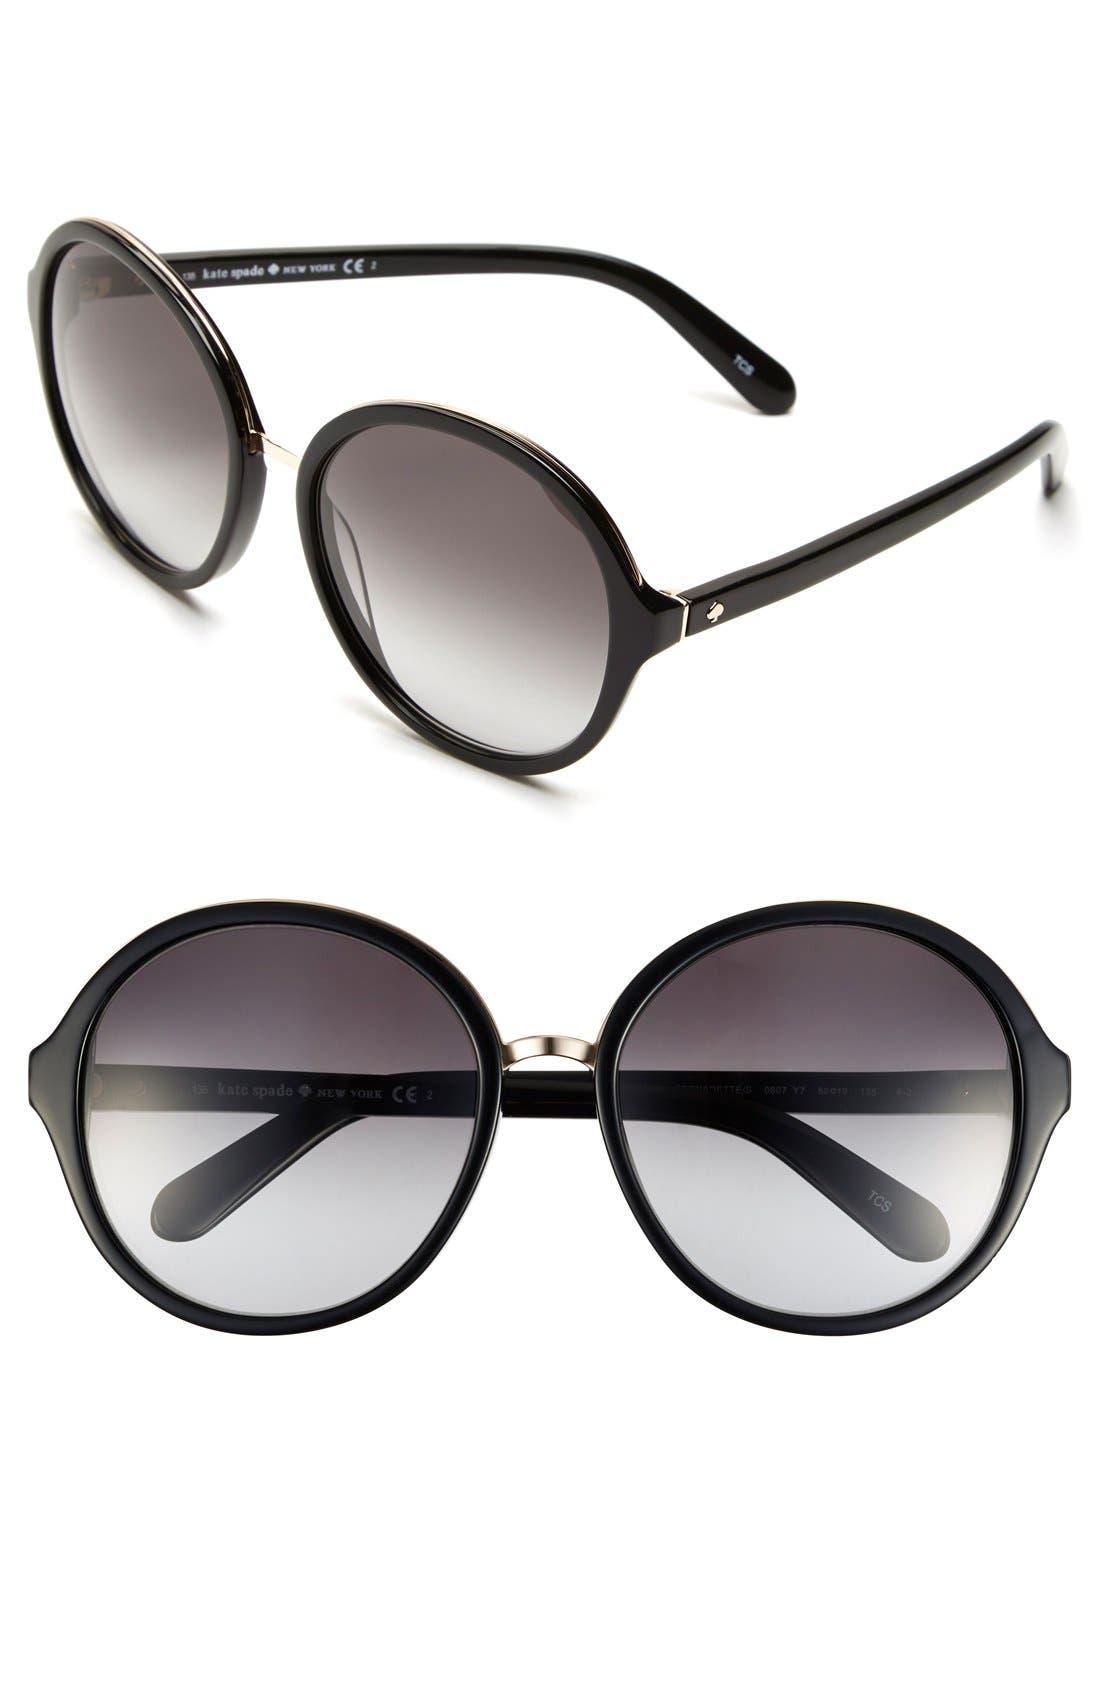 Alternate Image 1 Selected - kate spade new york 'bernadette' 58mm gradient sunglasses